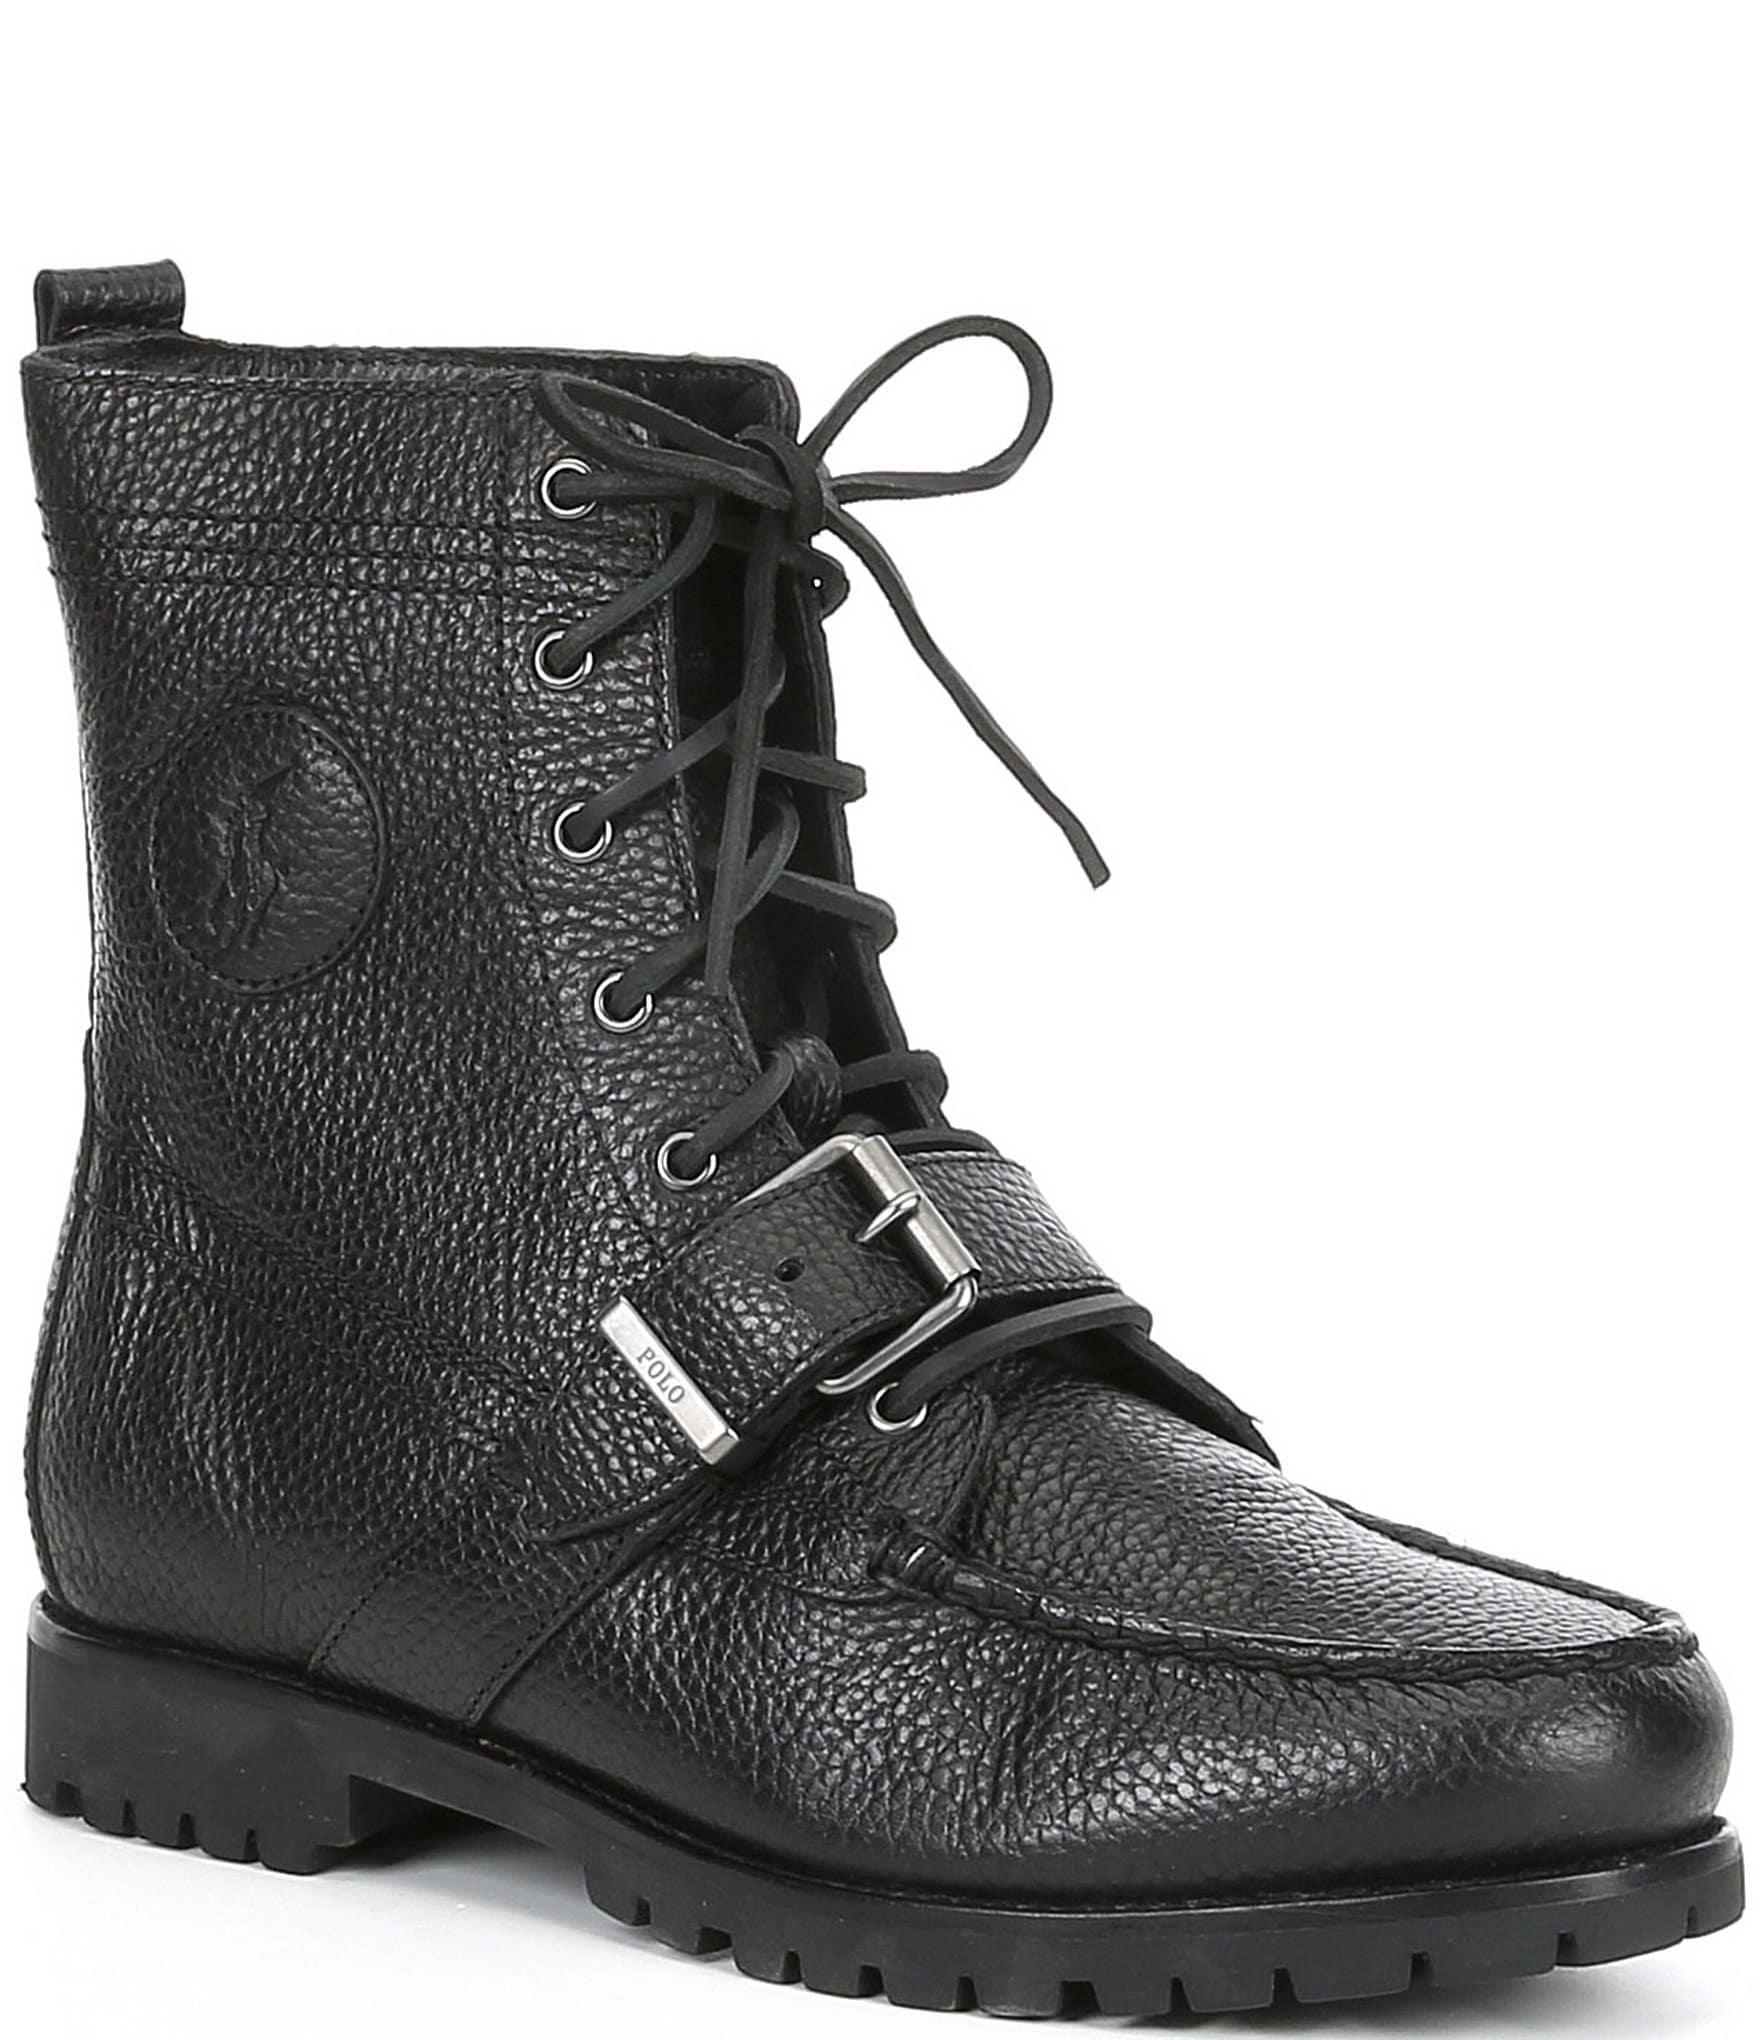 aaa21649 Polo Ralph Lauren Men's Ranger Leather Buckle Boots | Dillard's